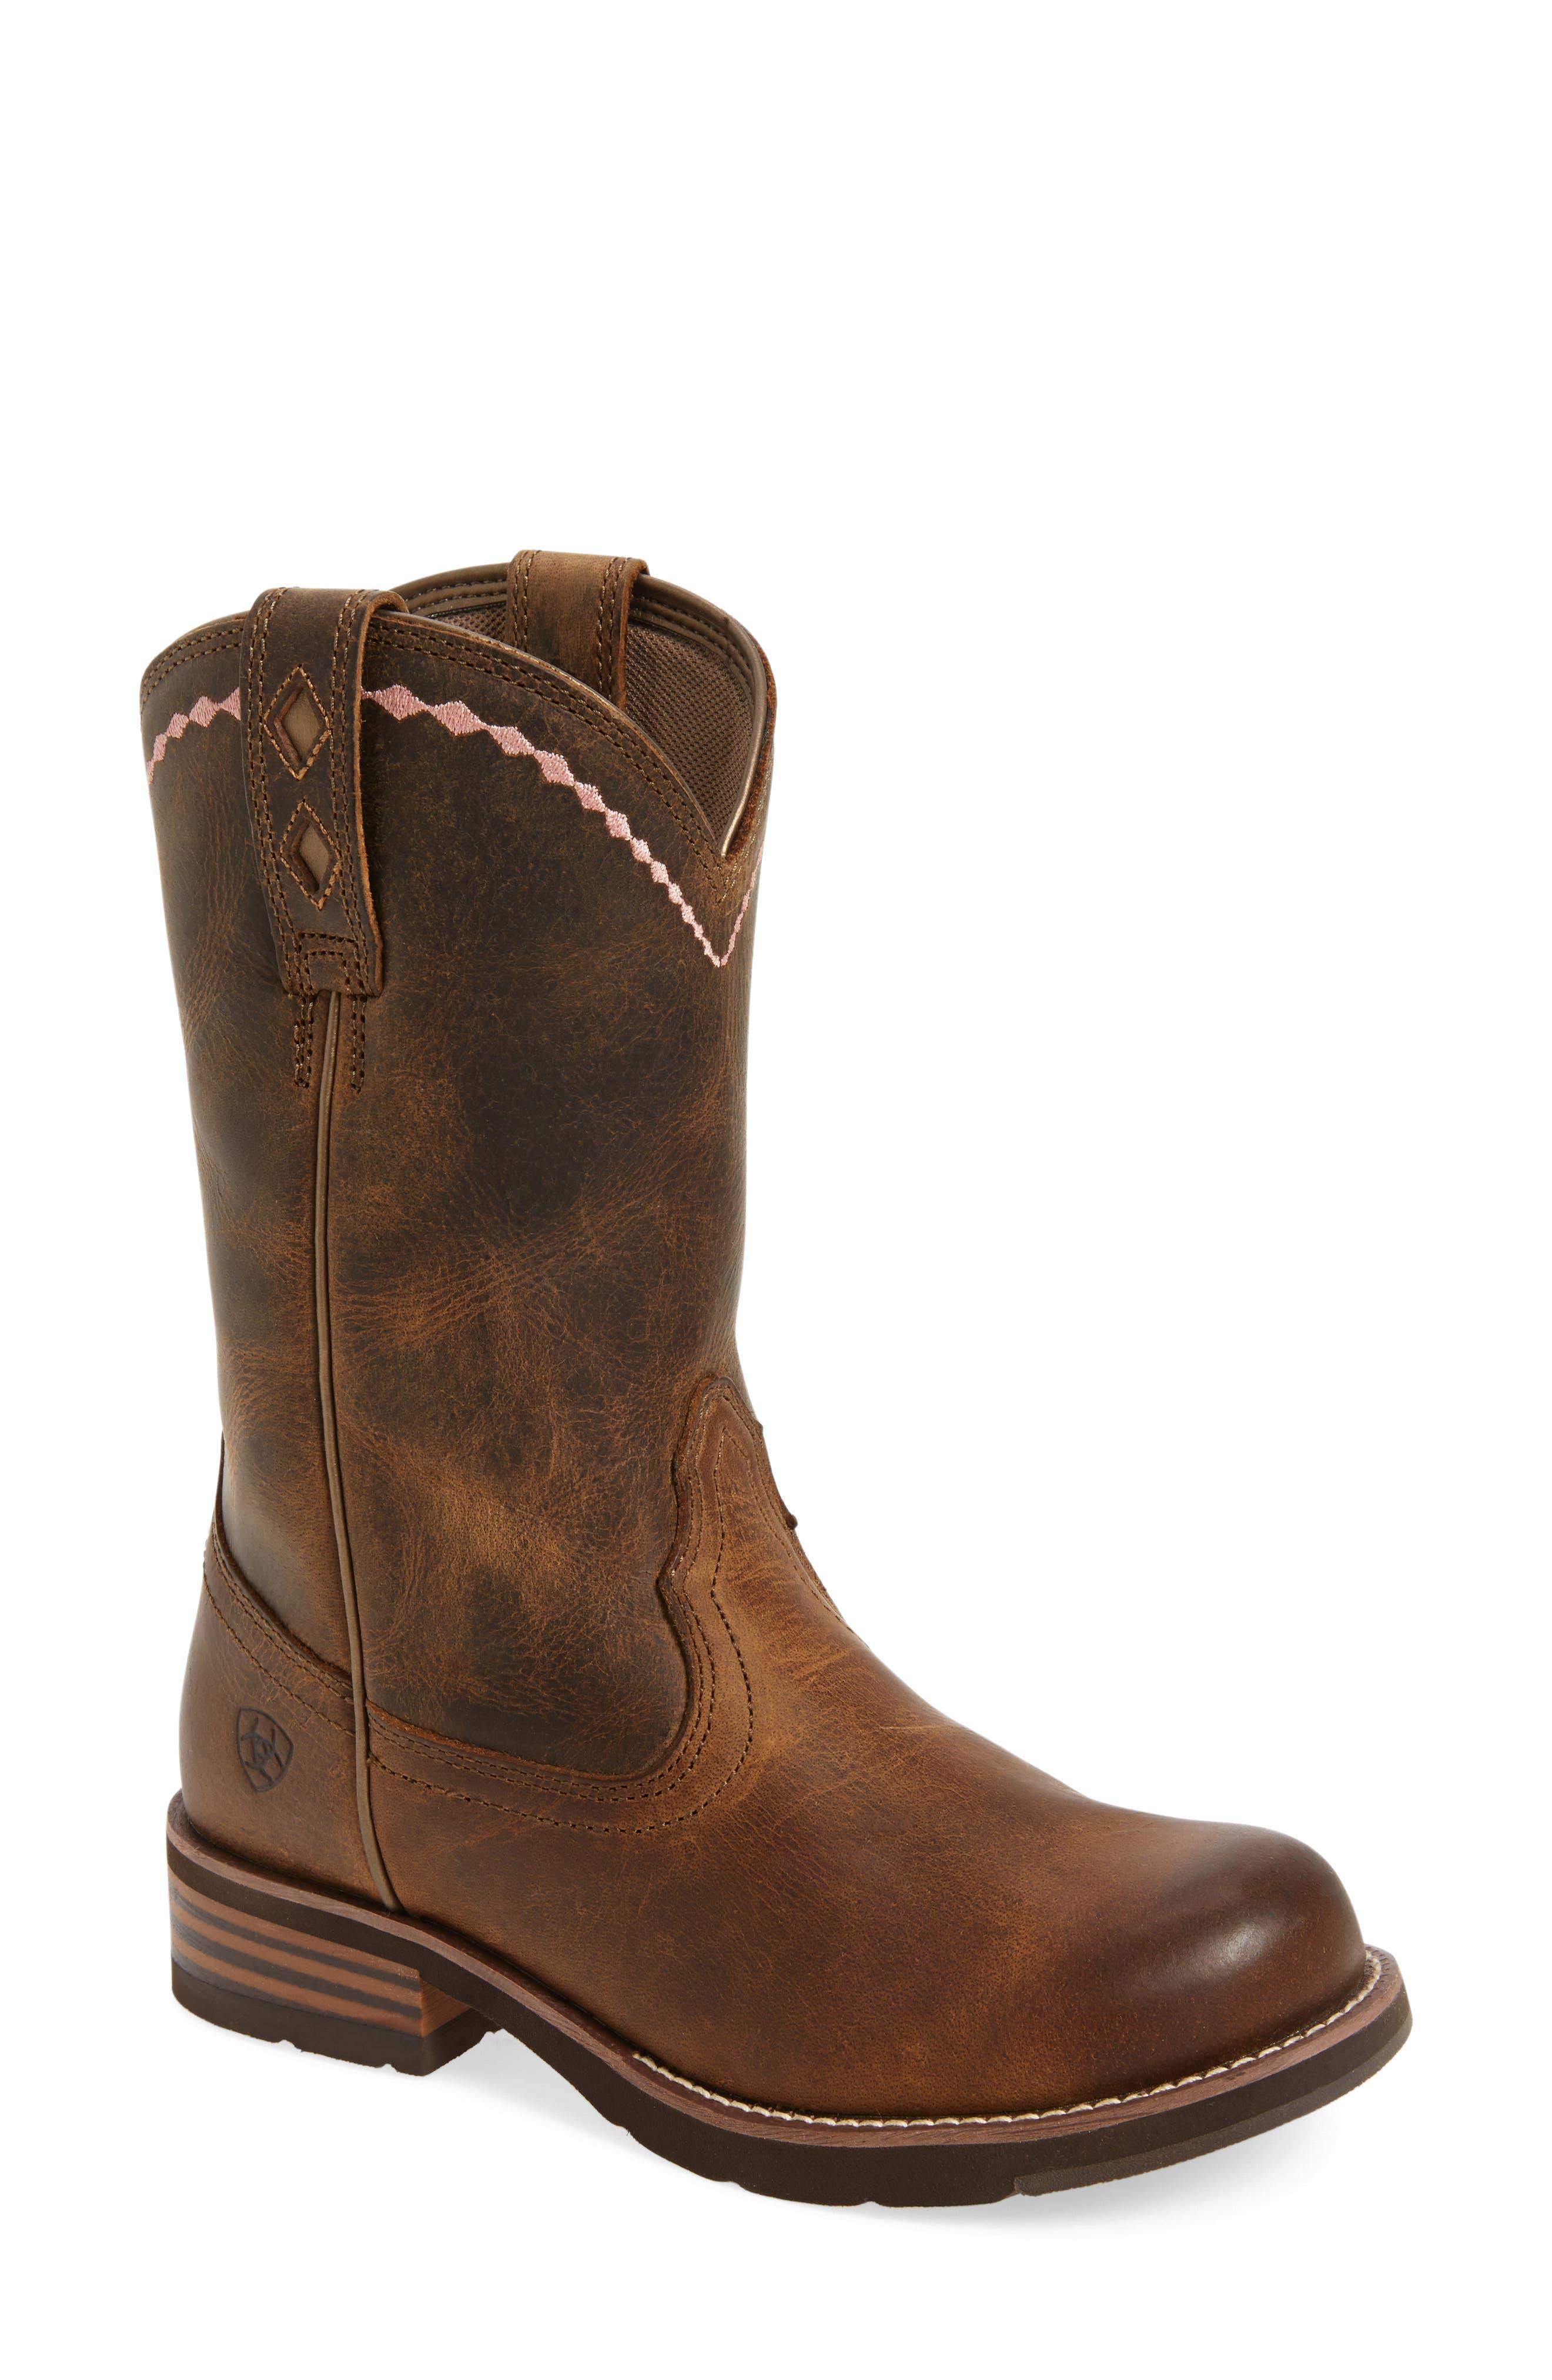 Main Image - Ariat Unbridled Roper Western Boot (Women)